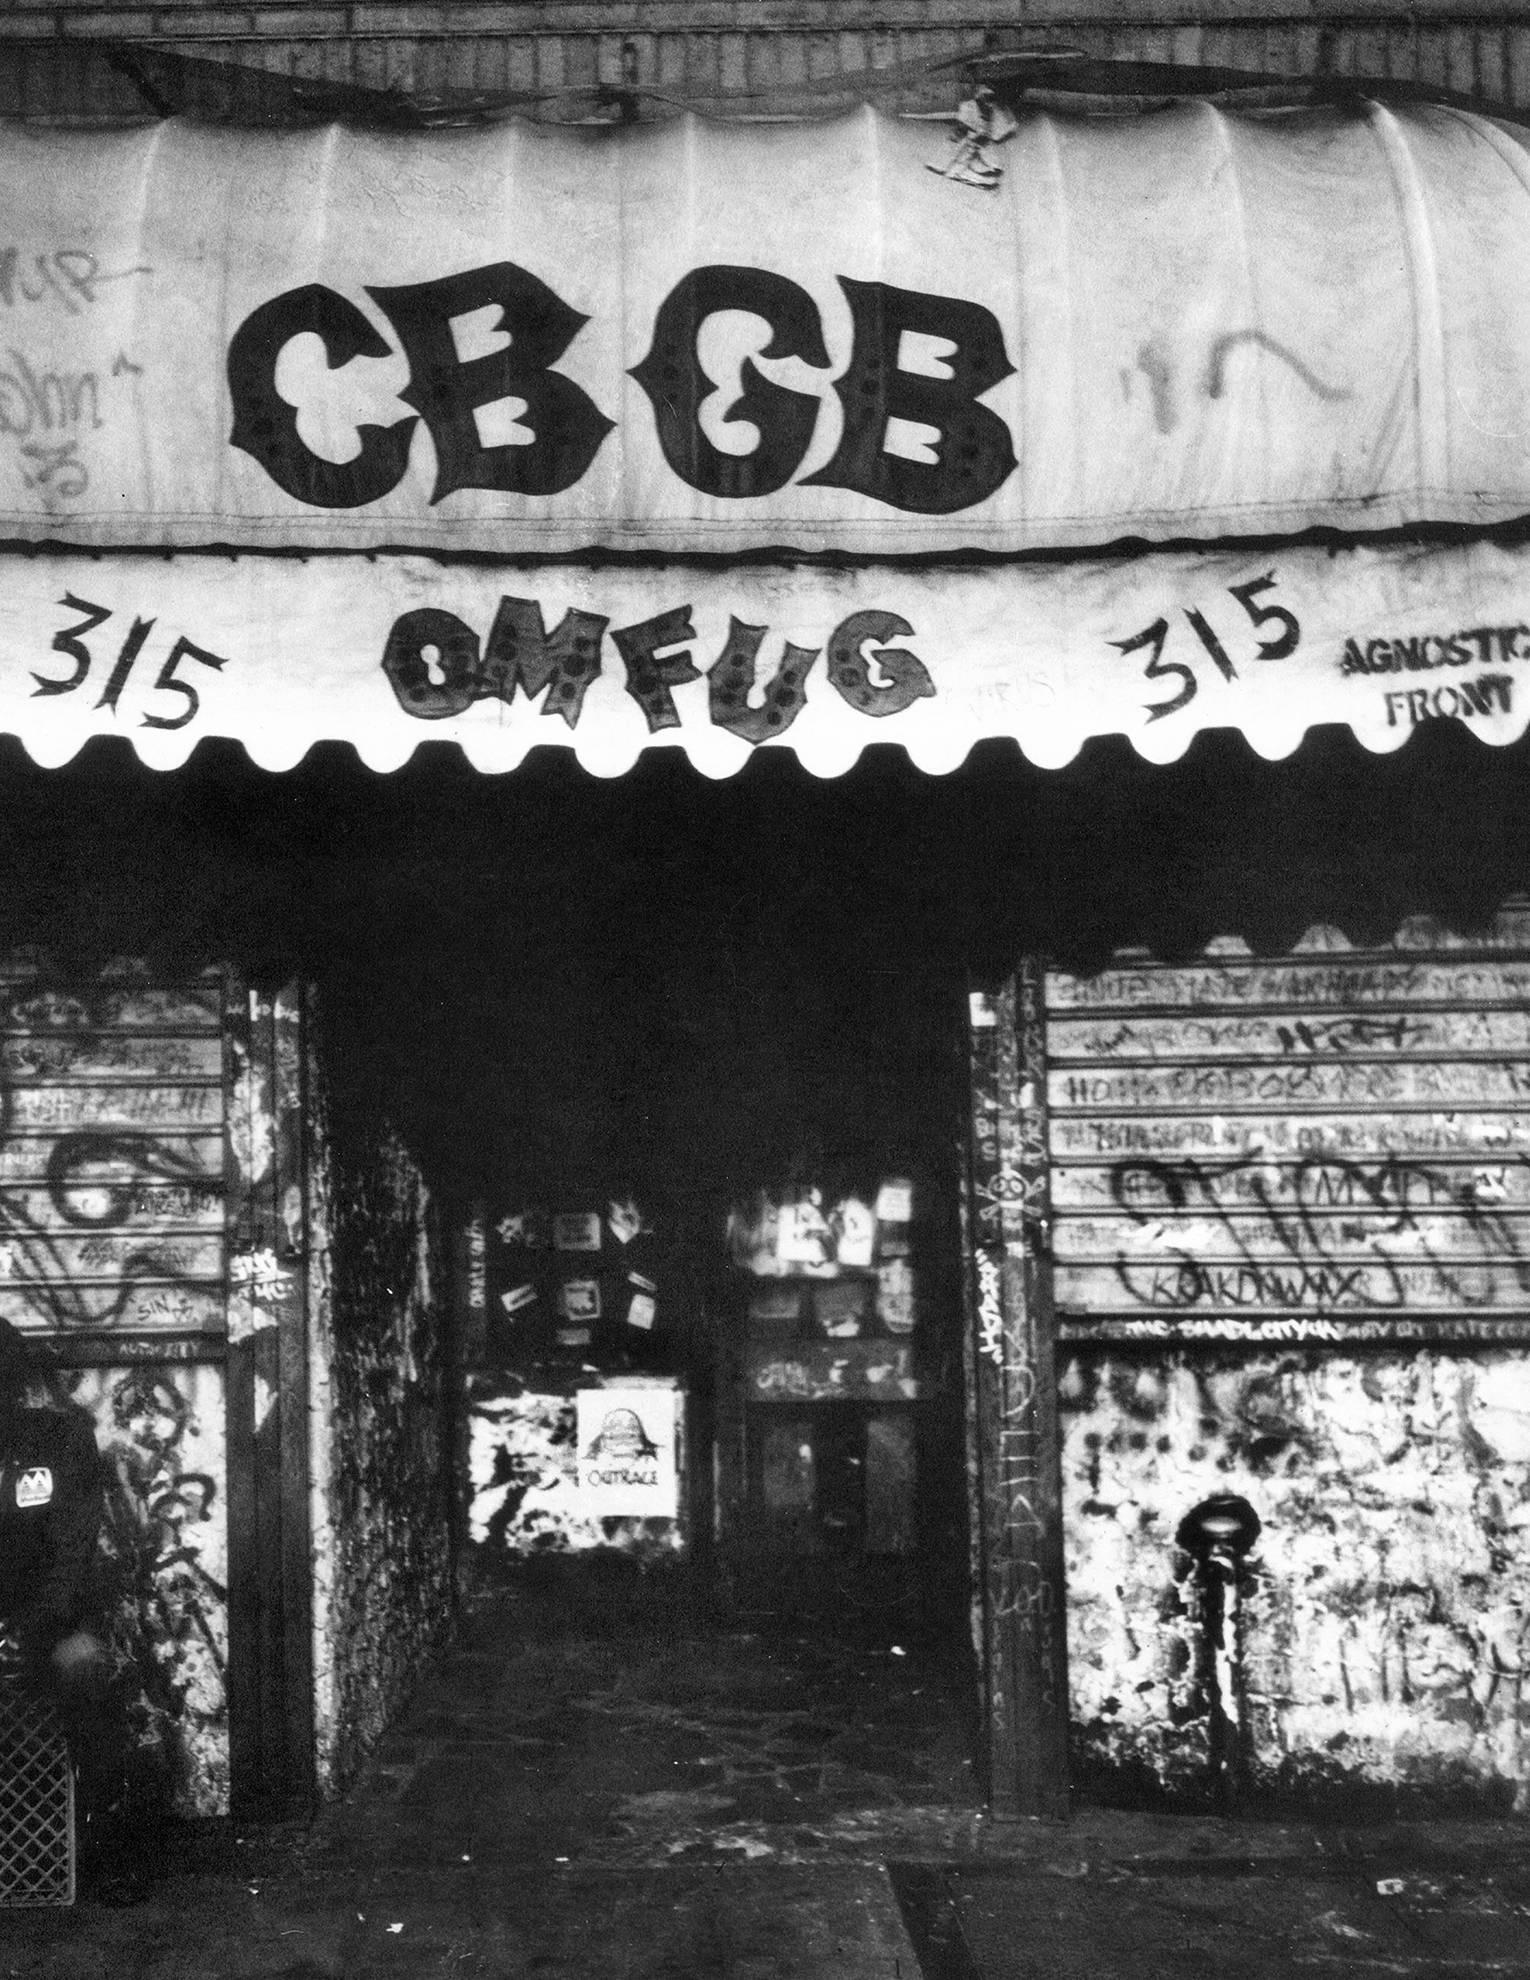 CBGB Photograph New York, 1982 (East Village)